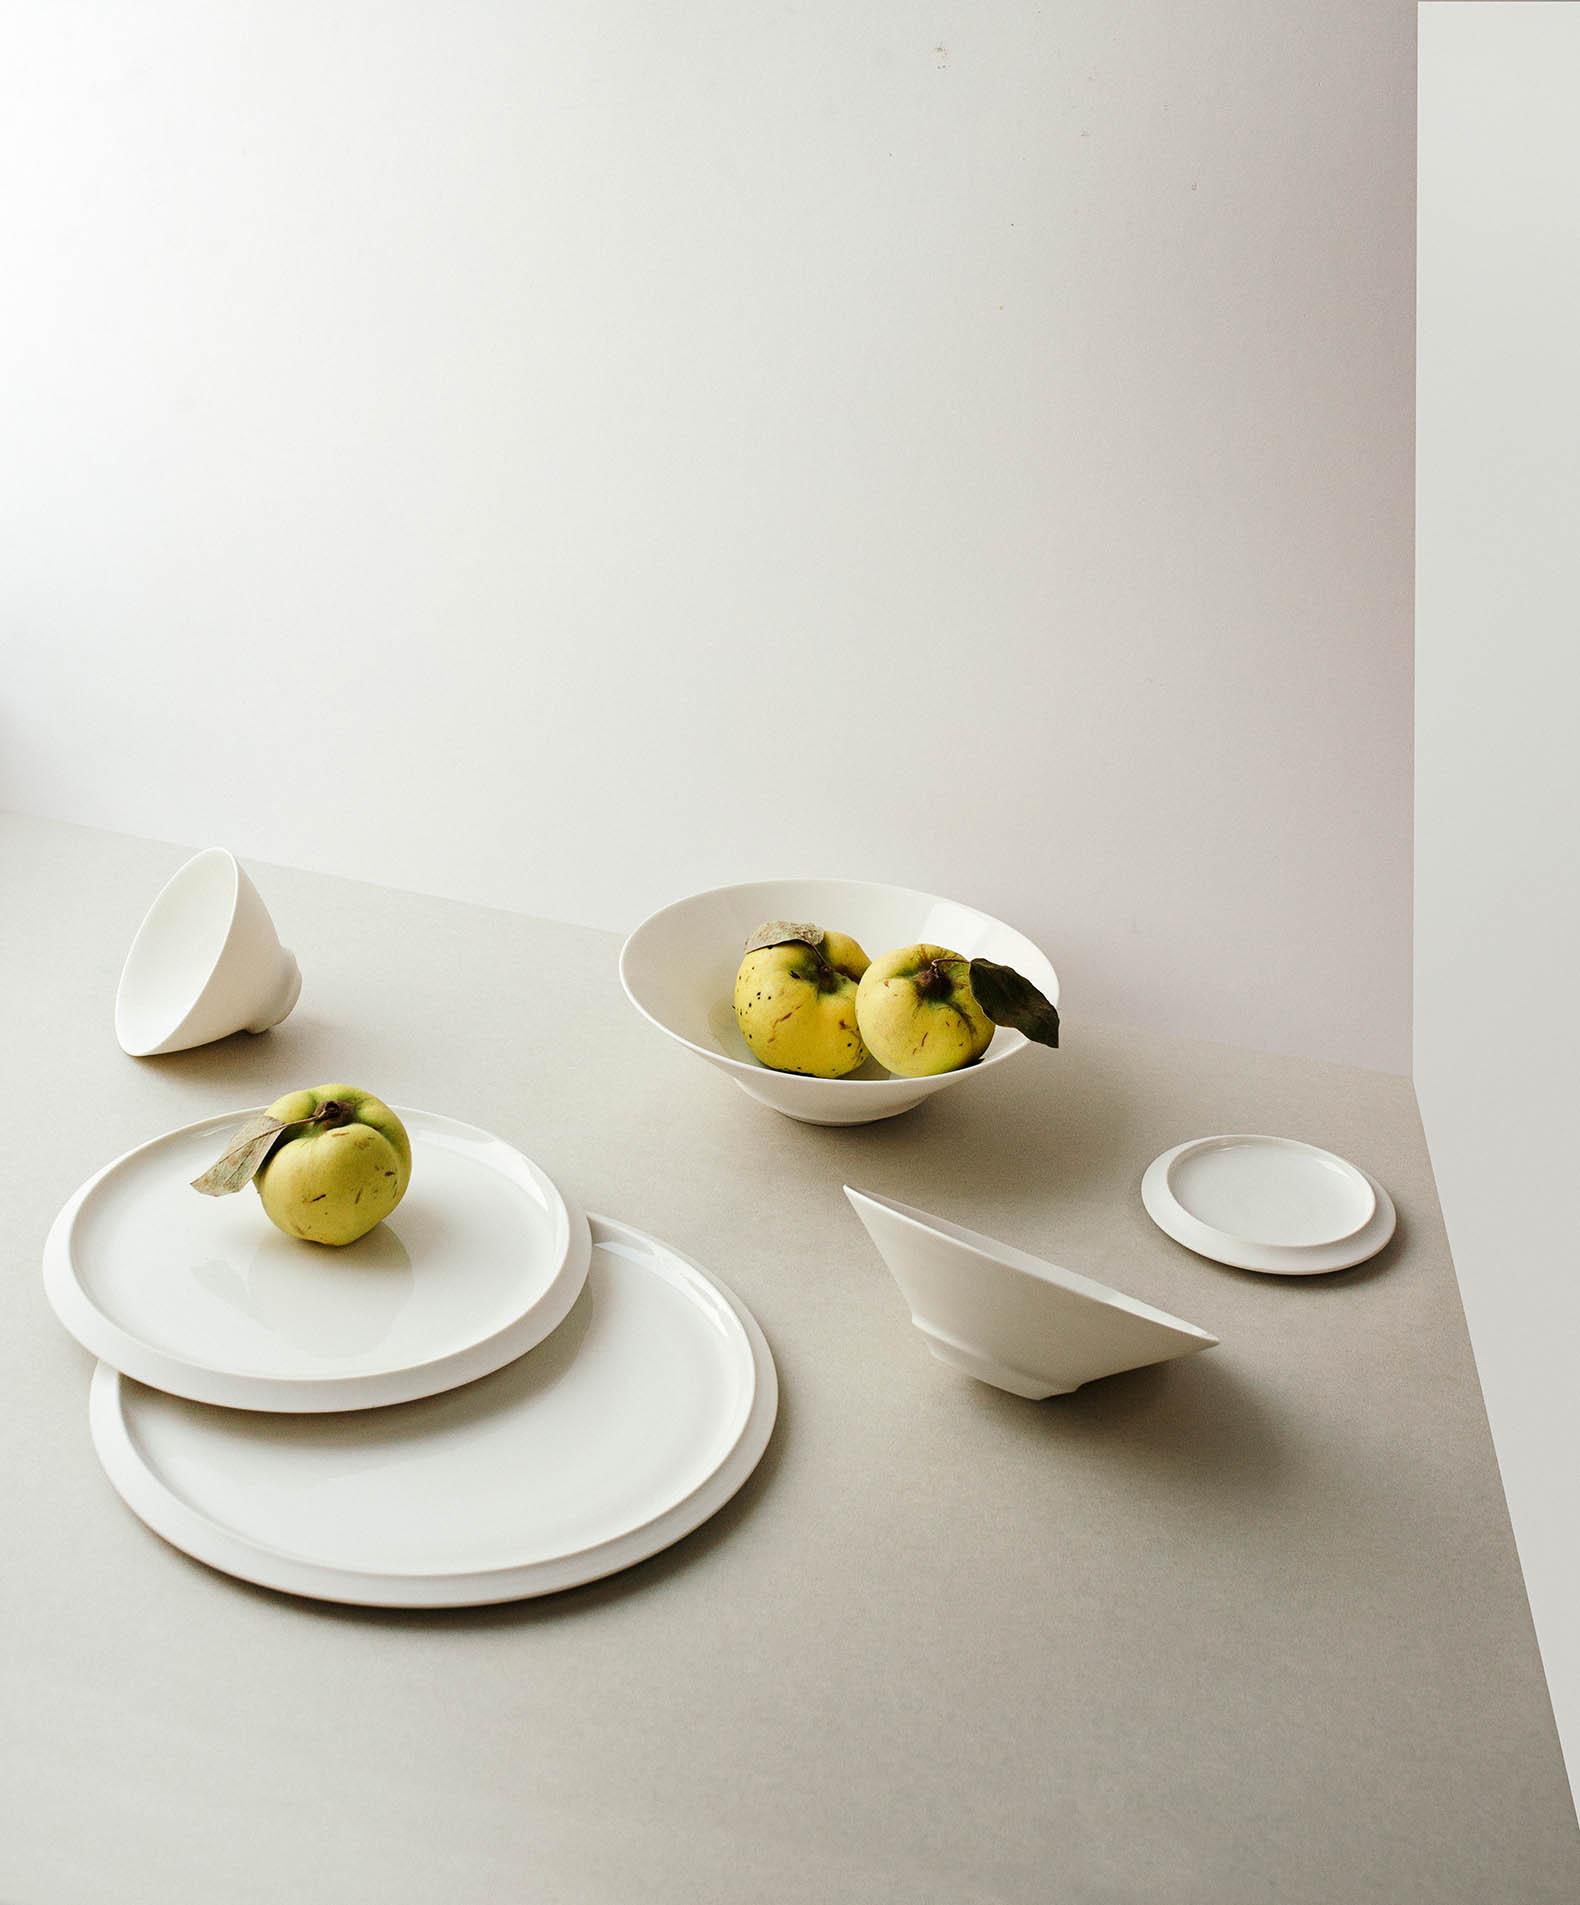 Claudia Schoemig, German Design Award